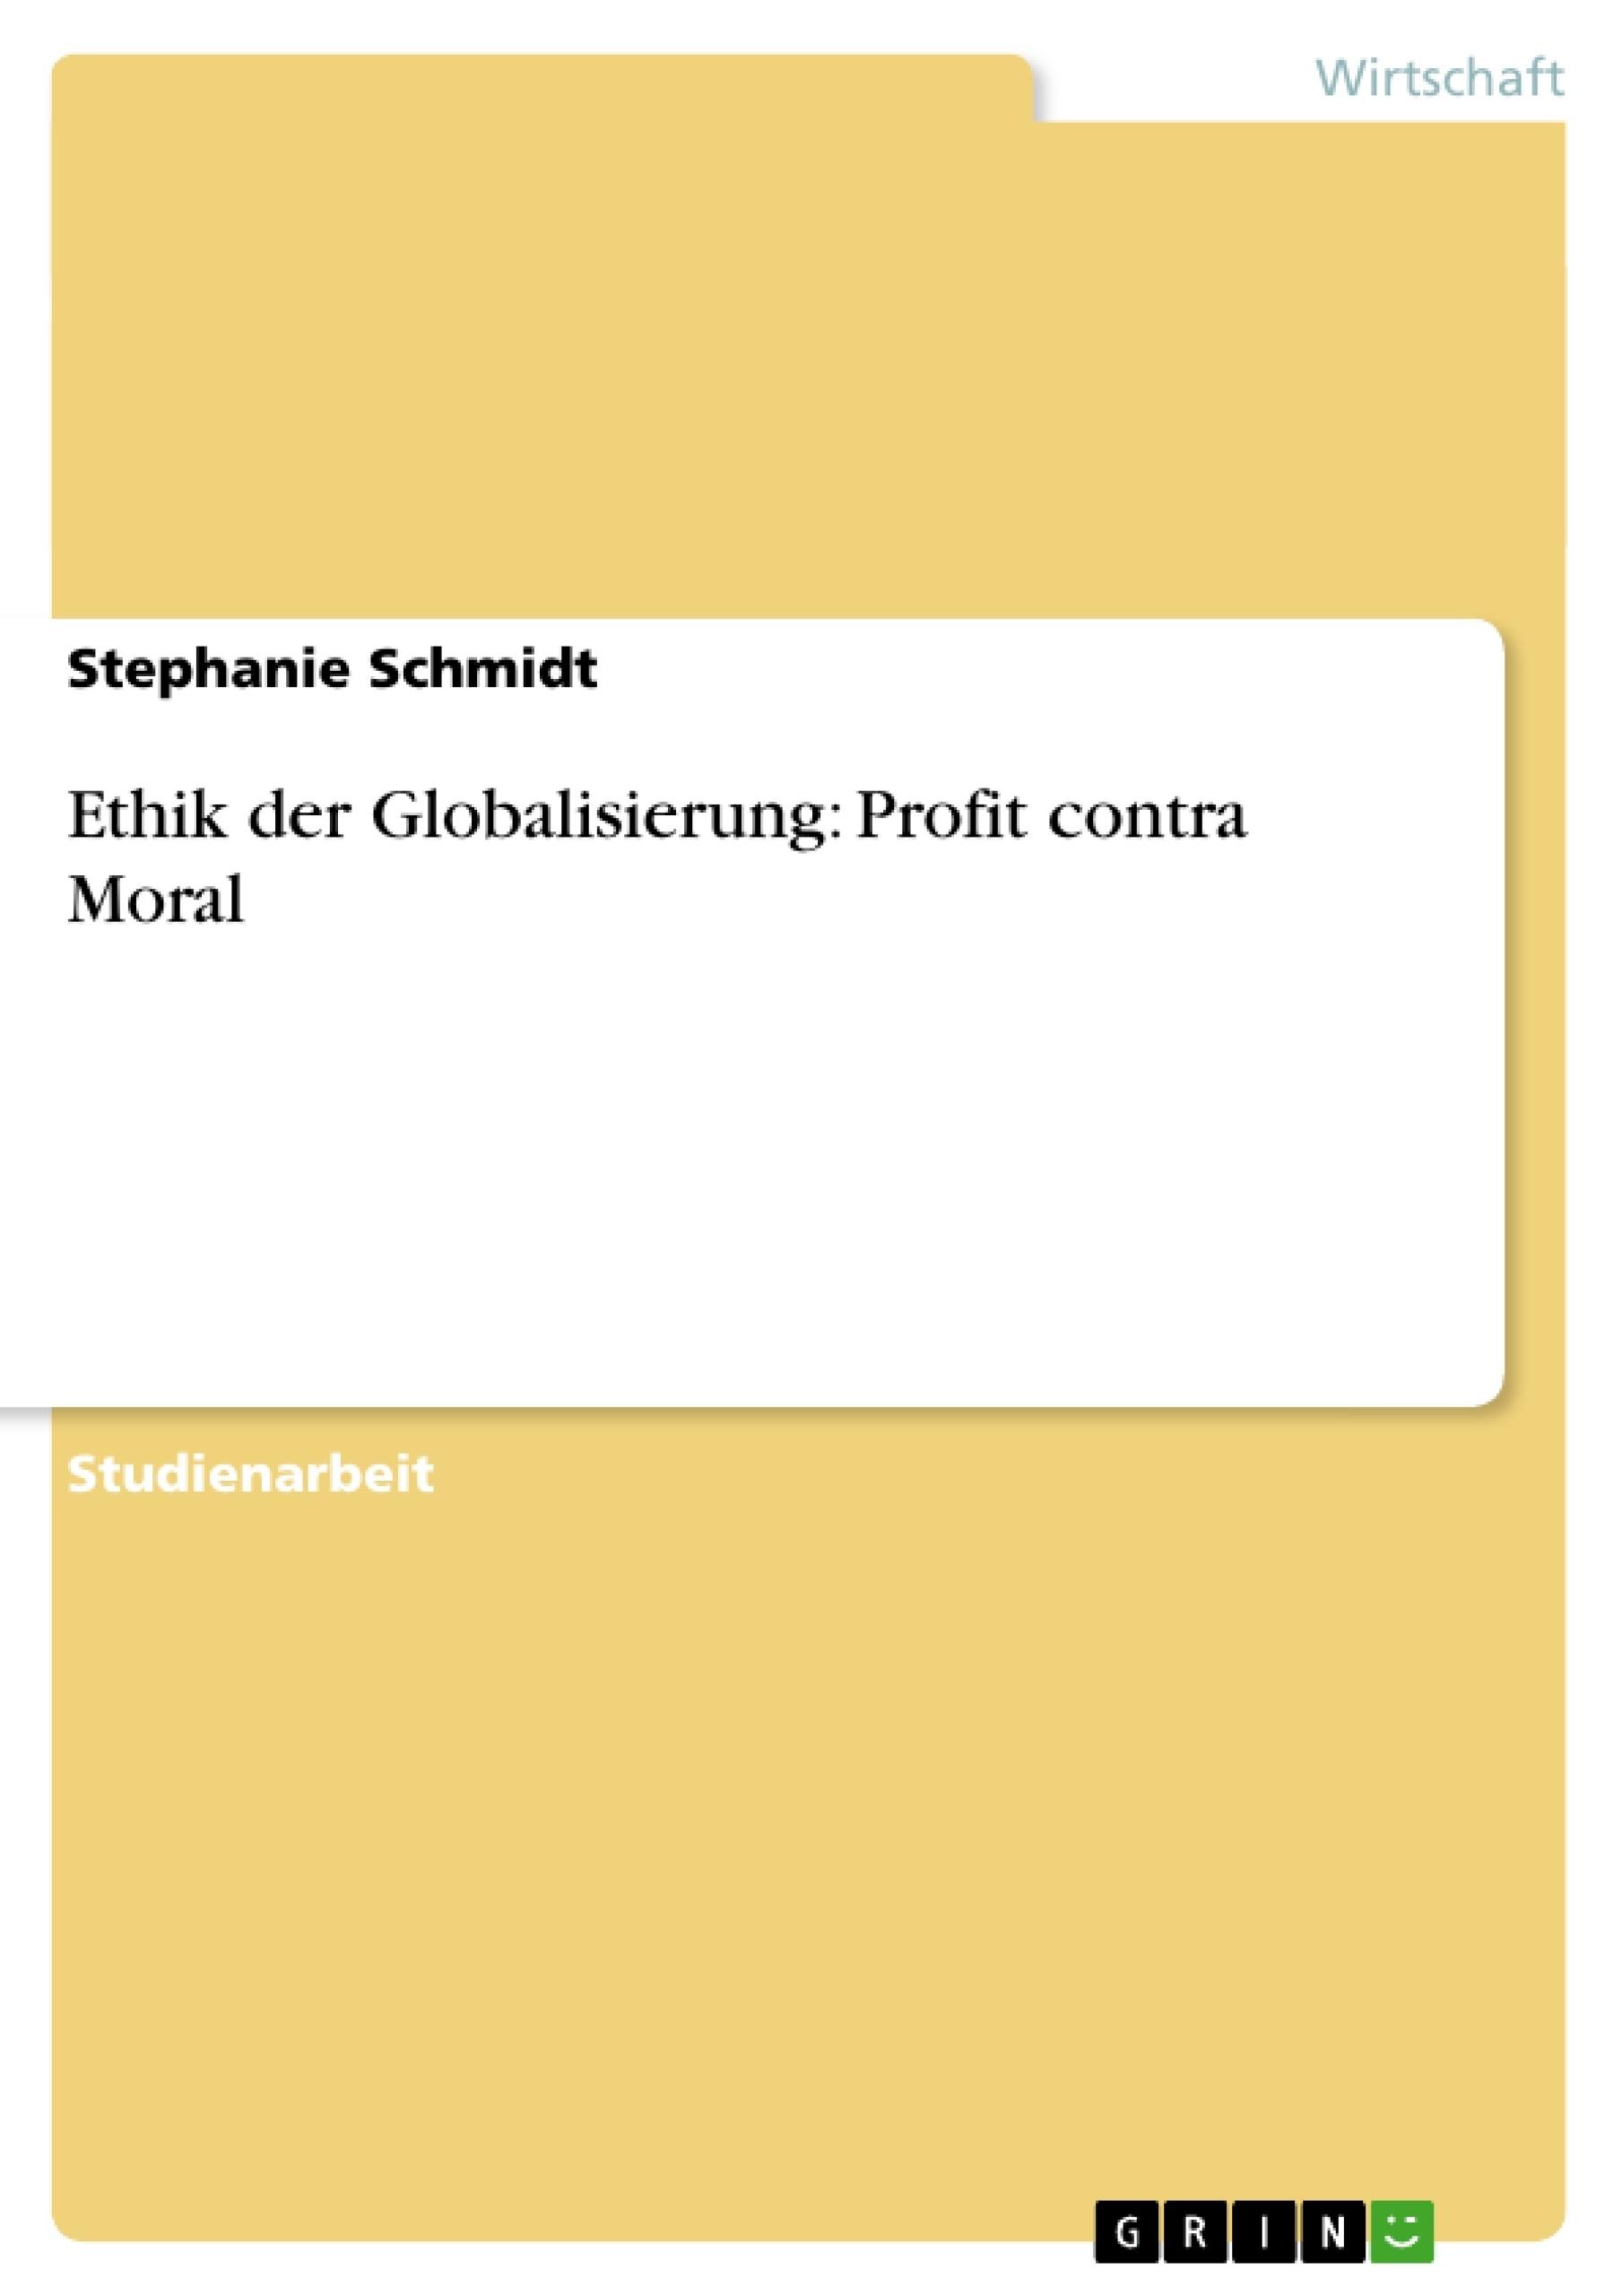 Titel: Ethik der Globalisierung: Profit contra Moral